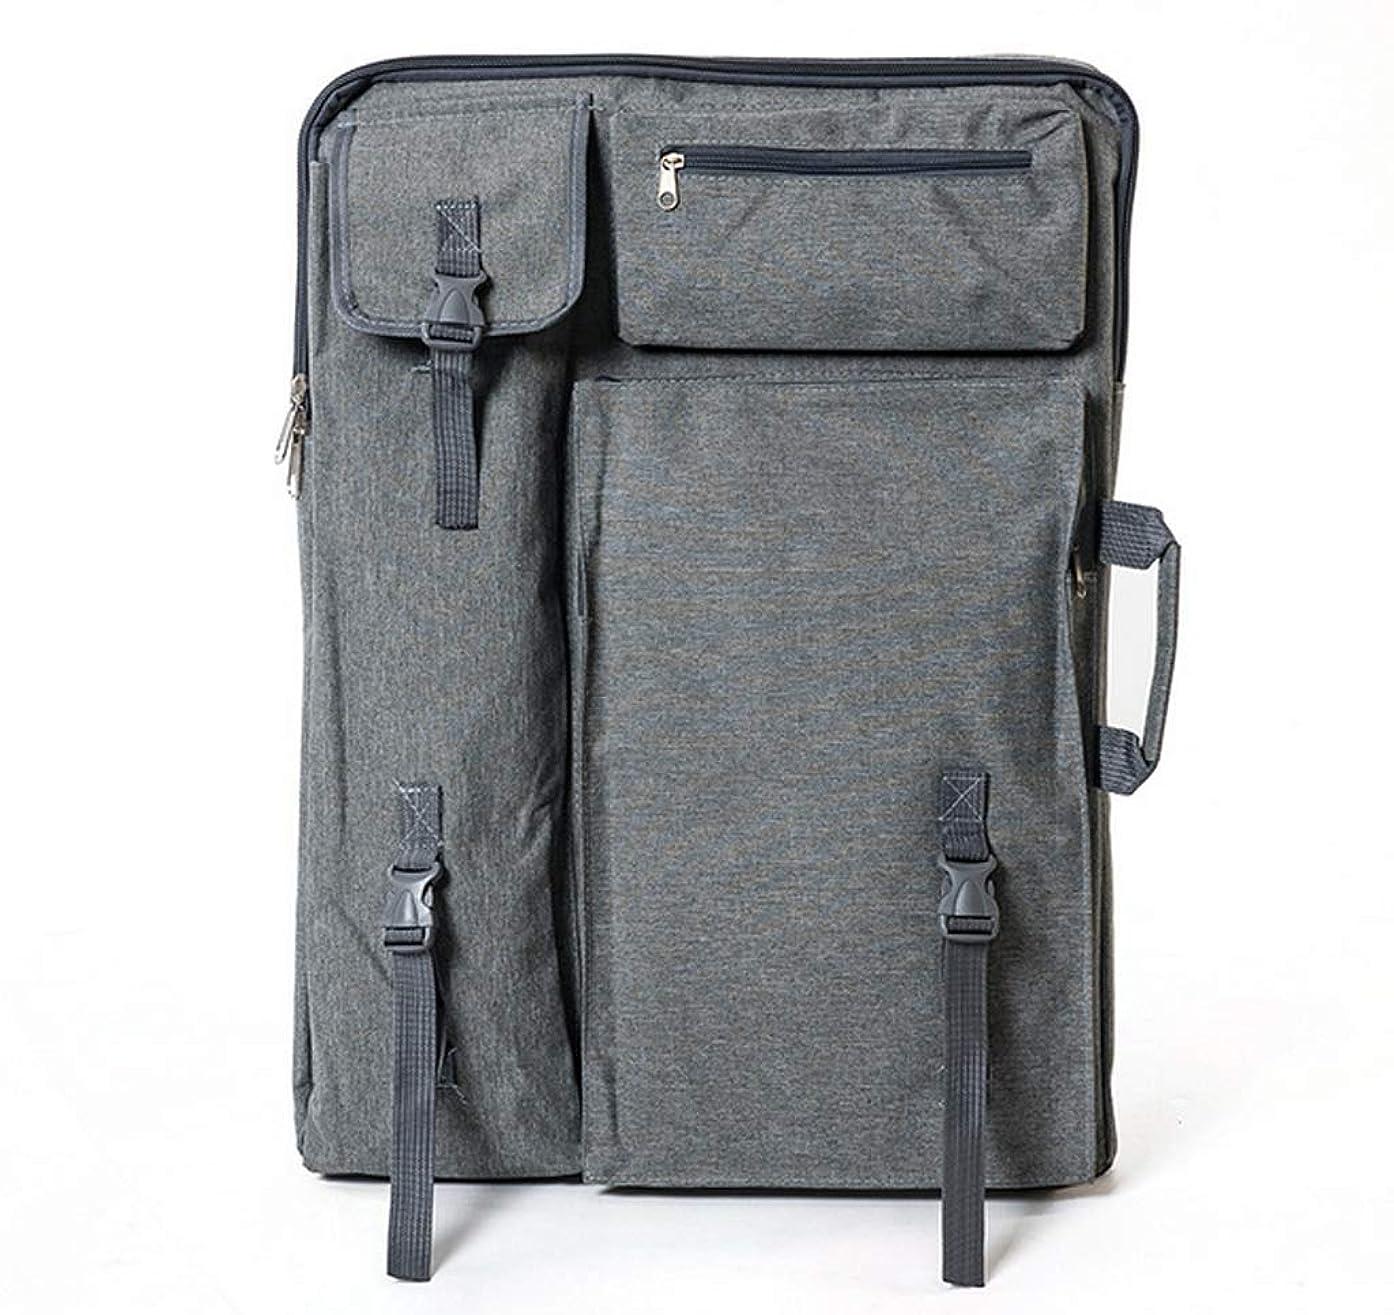 Art Portfolio Bag Carrying Case - Outdoor Artist Art Supply Sketch Board Travel Sketchpad Drawing Board Bag for Artwork Storage Easel Palette Art Student Photo Sketching Painting Easel Palette, Grey